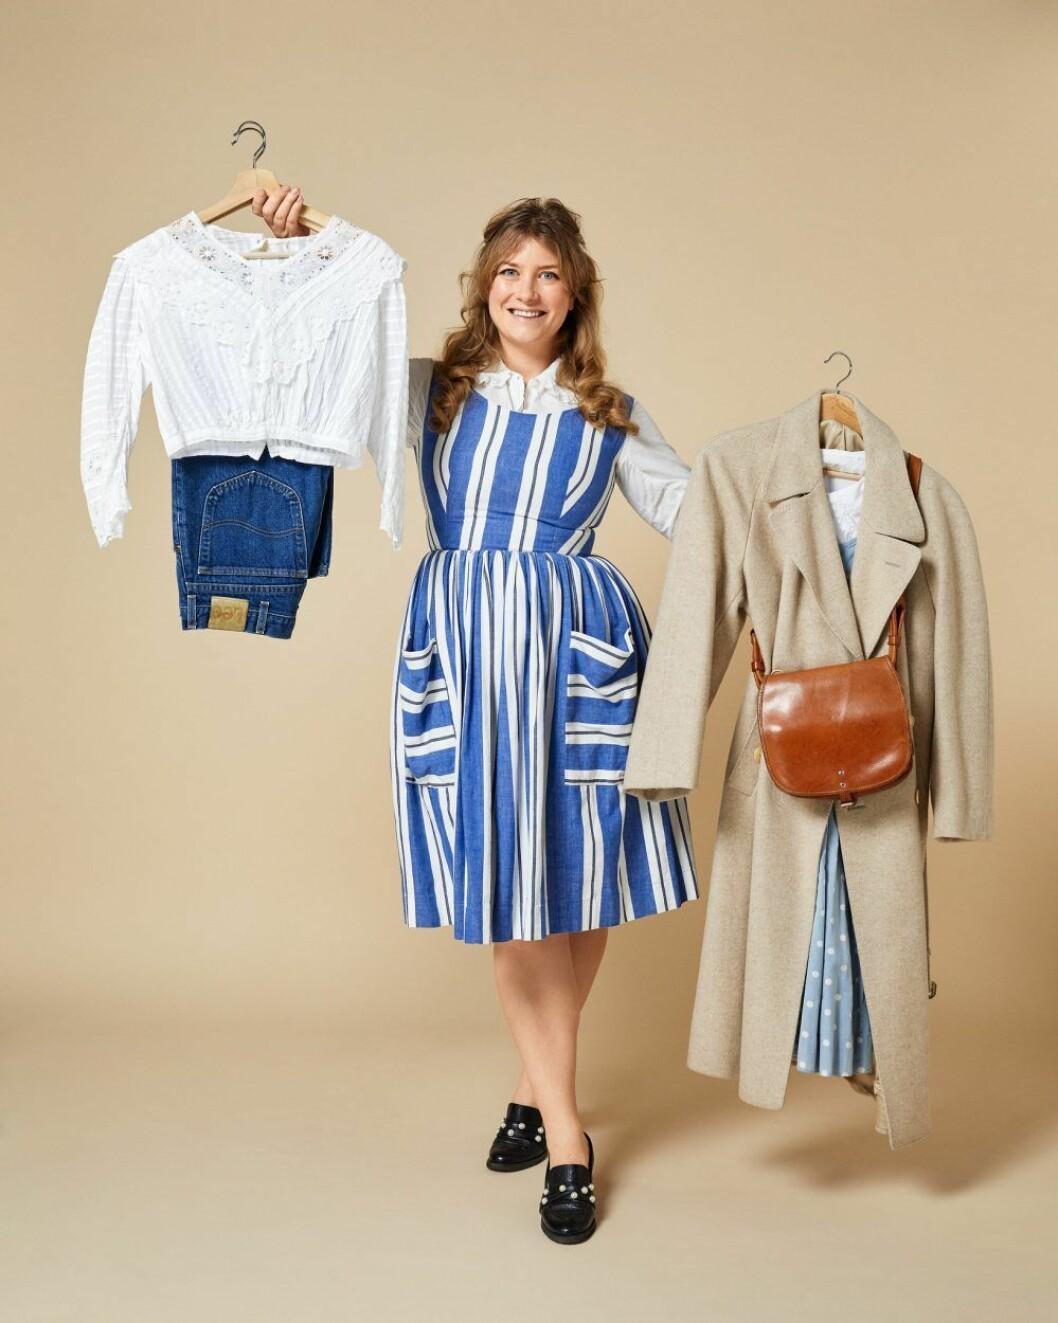 Elsa Billgren öppnar vintageabonnemang med Independent kostym – min vintagegarderob